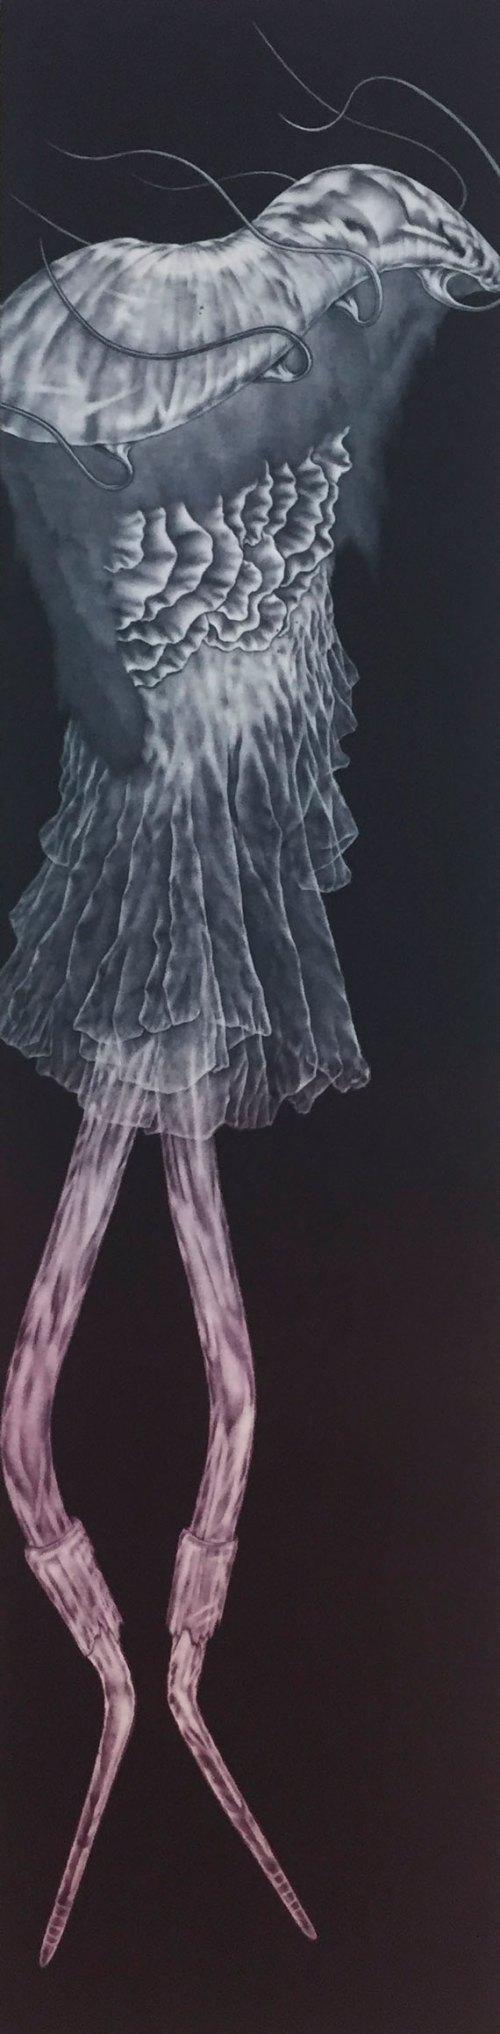 Graeme-Peebles-The-Sugar-Plum-Fairy